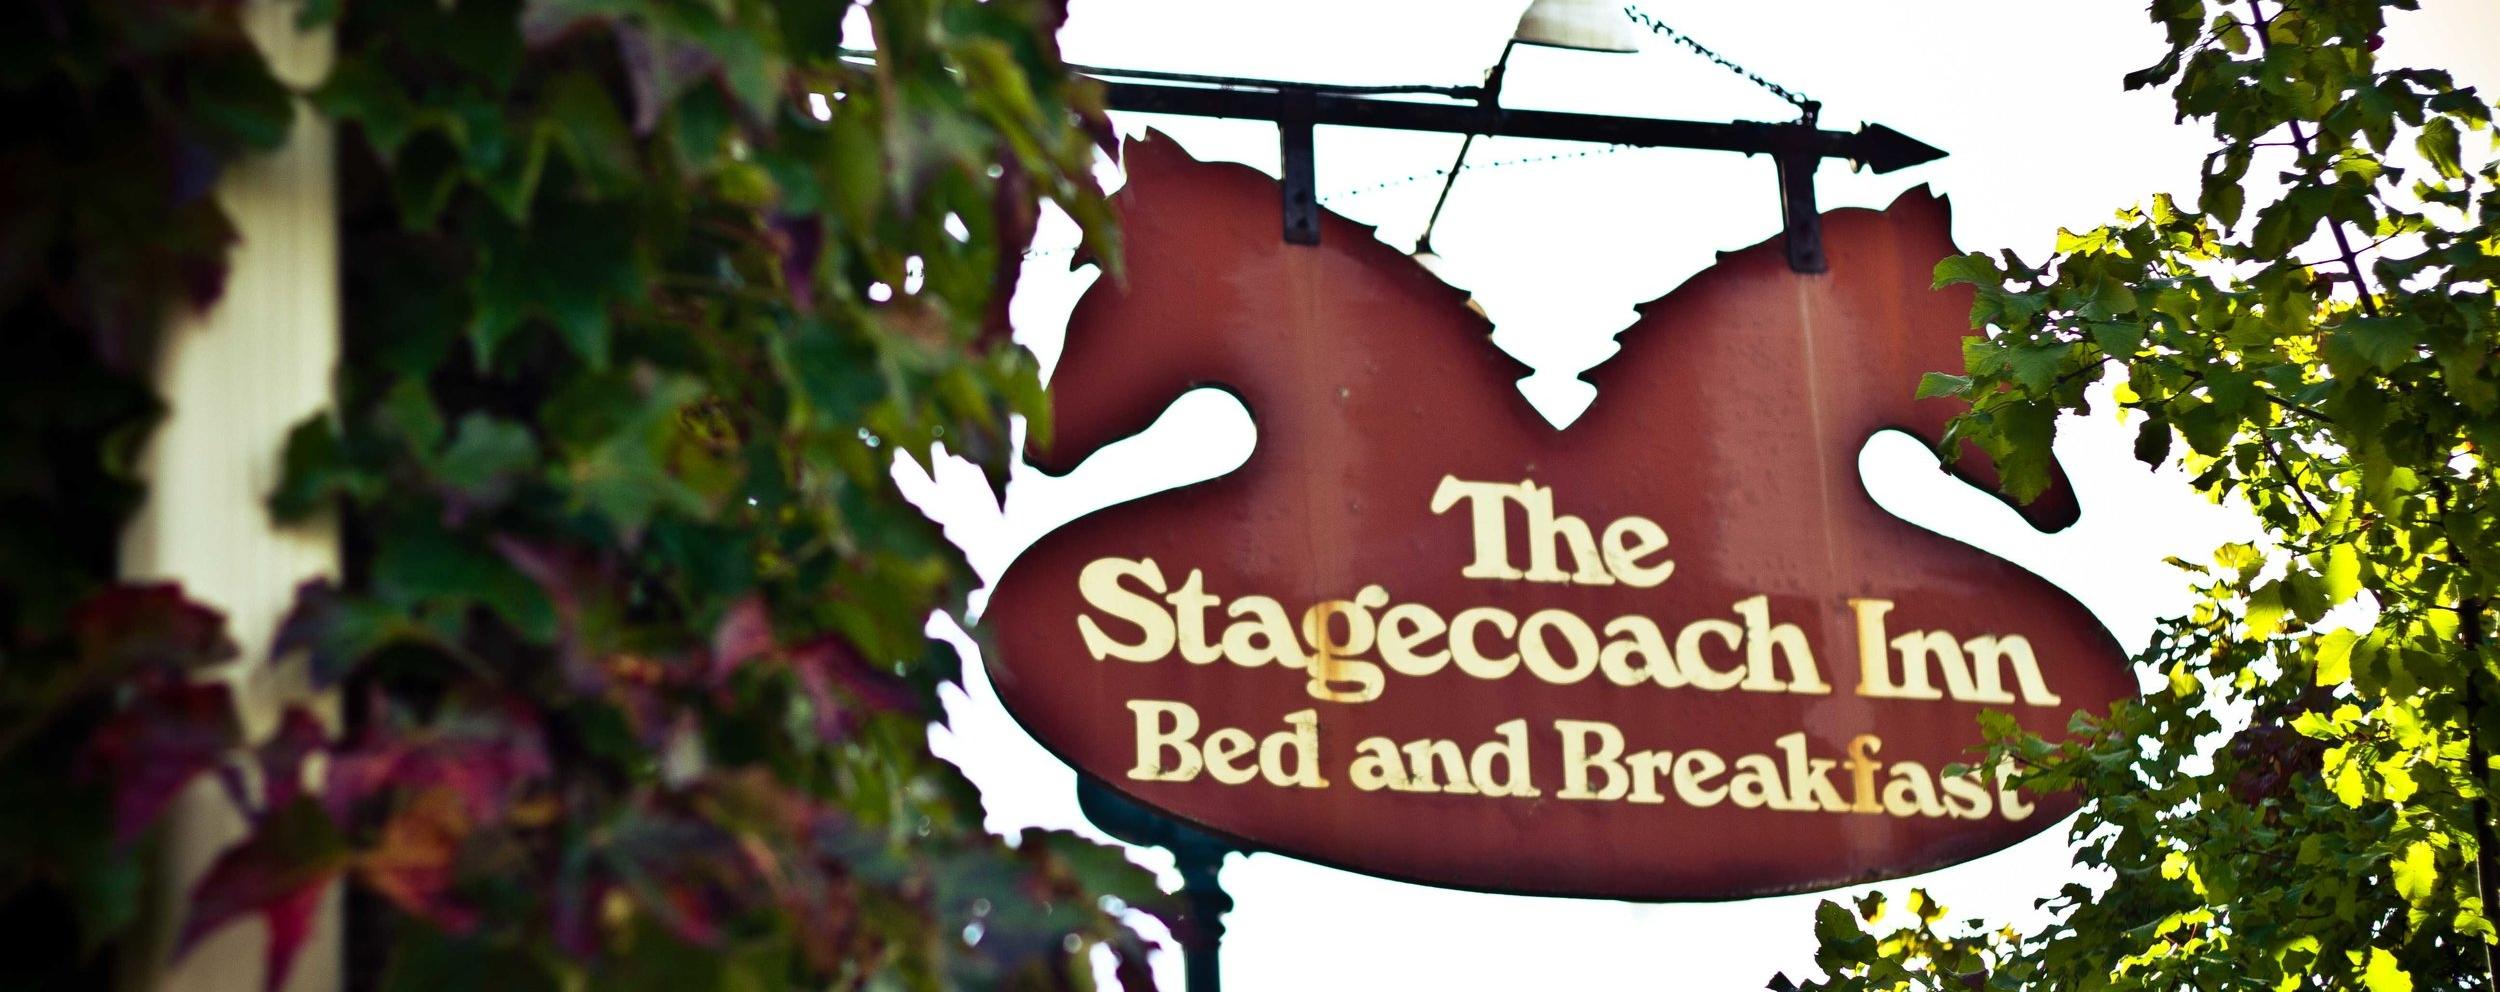 StagecoachInnSign_MG_3166.jpg